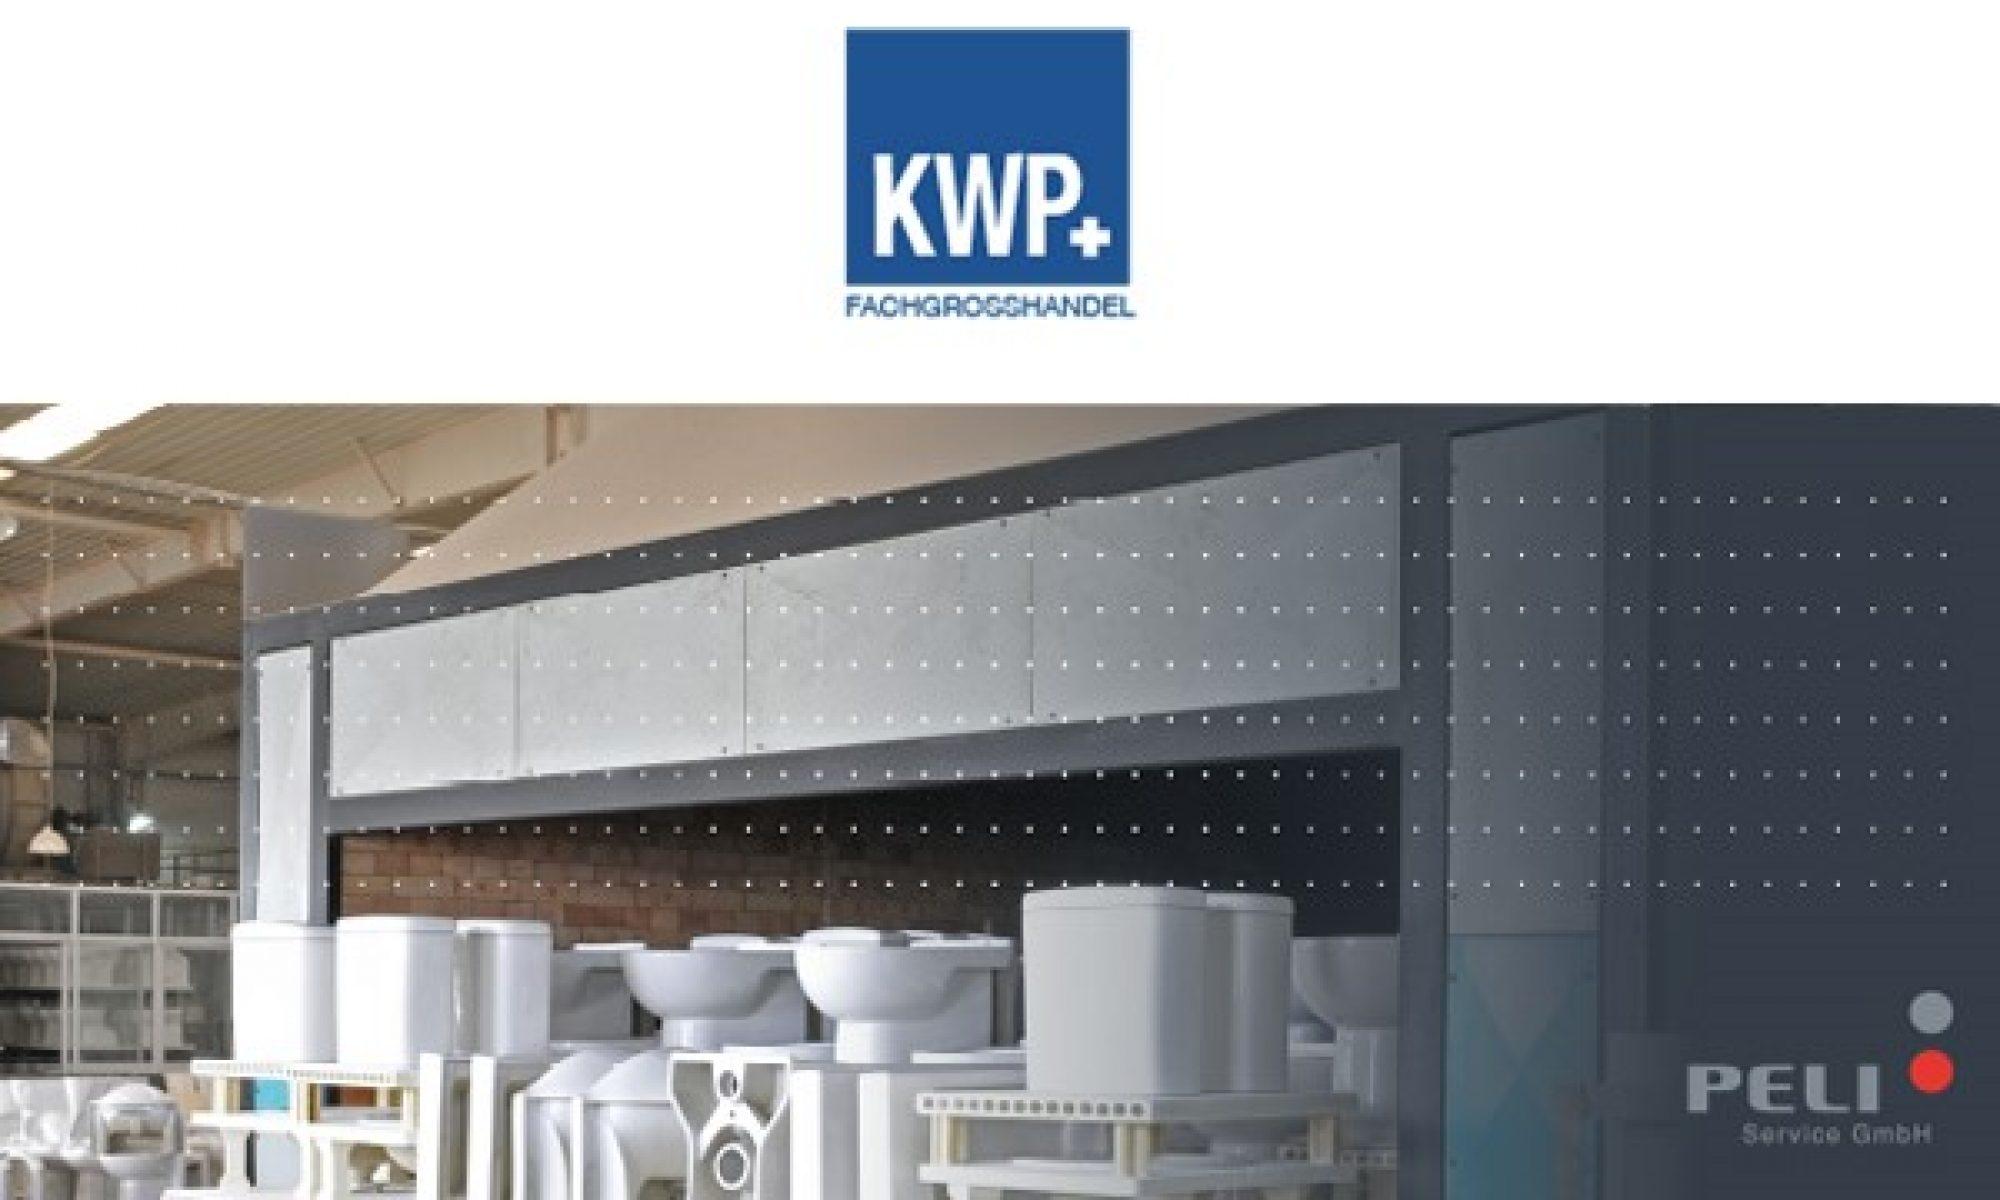 KWP+ FGH